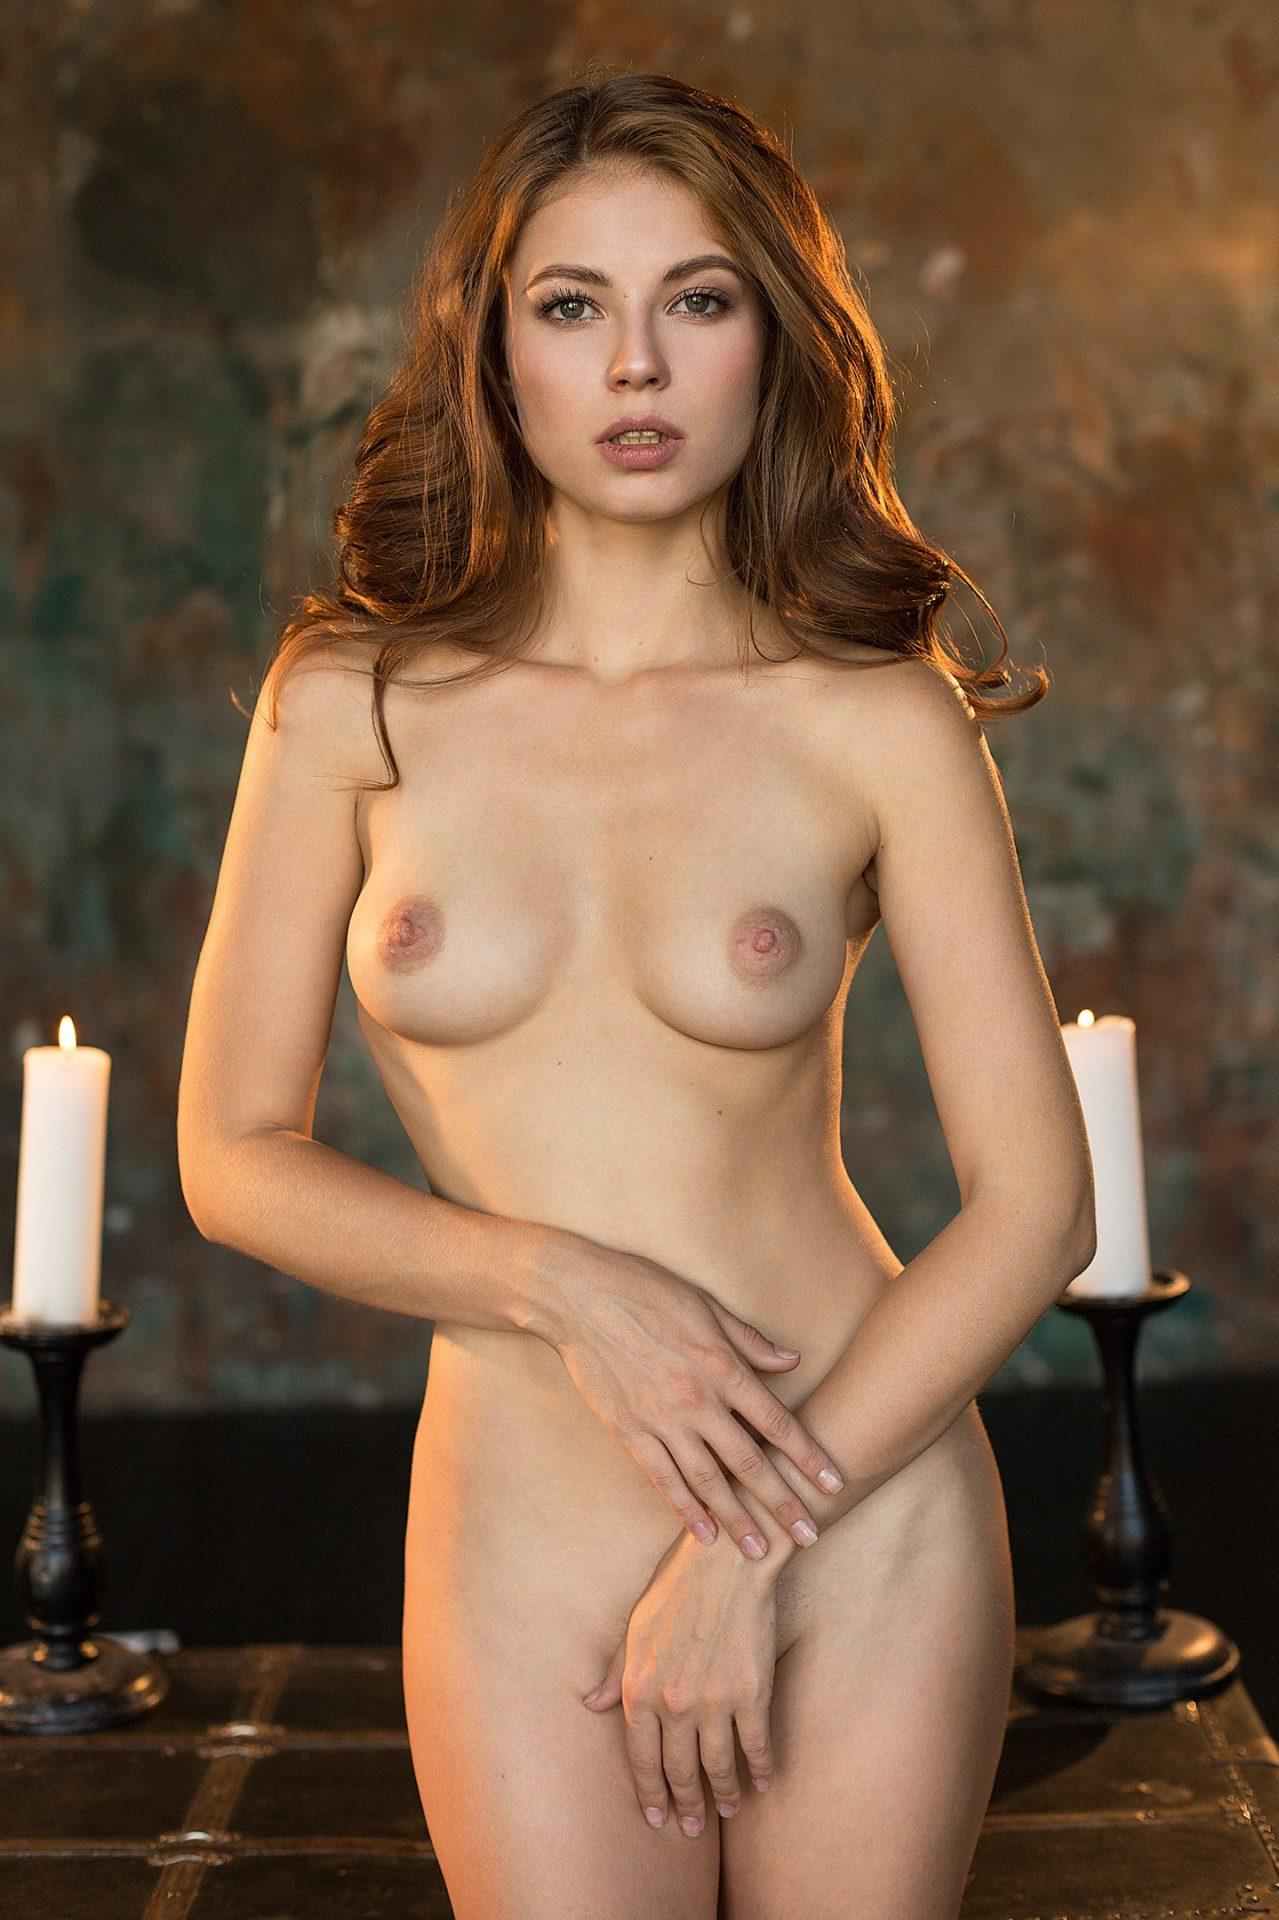 Viktoriia Aliko by Damp Zergut